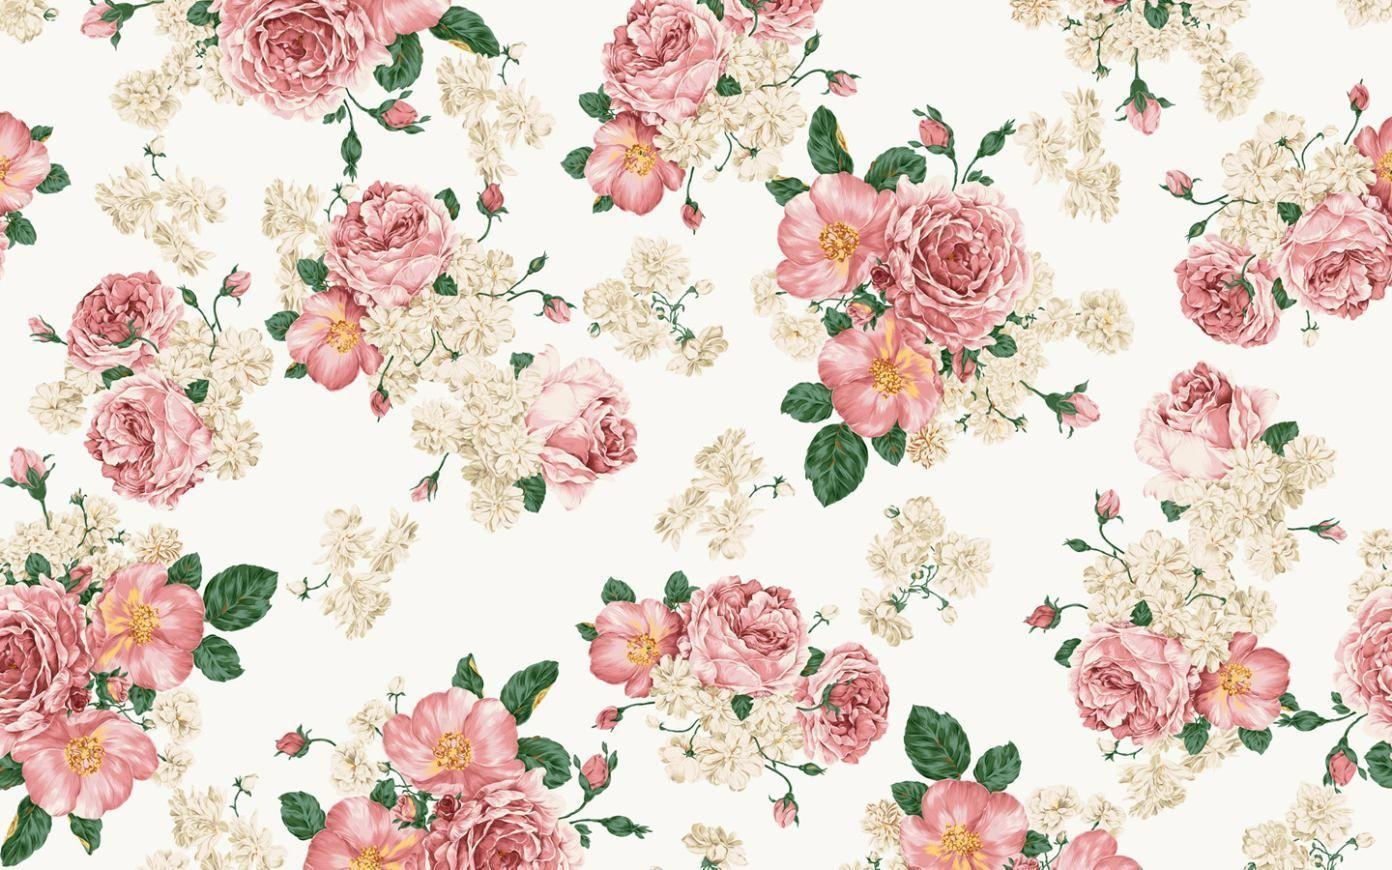 Fondos De Pantalla Hd Flores: Fondos De Flores Vintage Para Fondo De Pantalla En 3D 1 HD